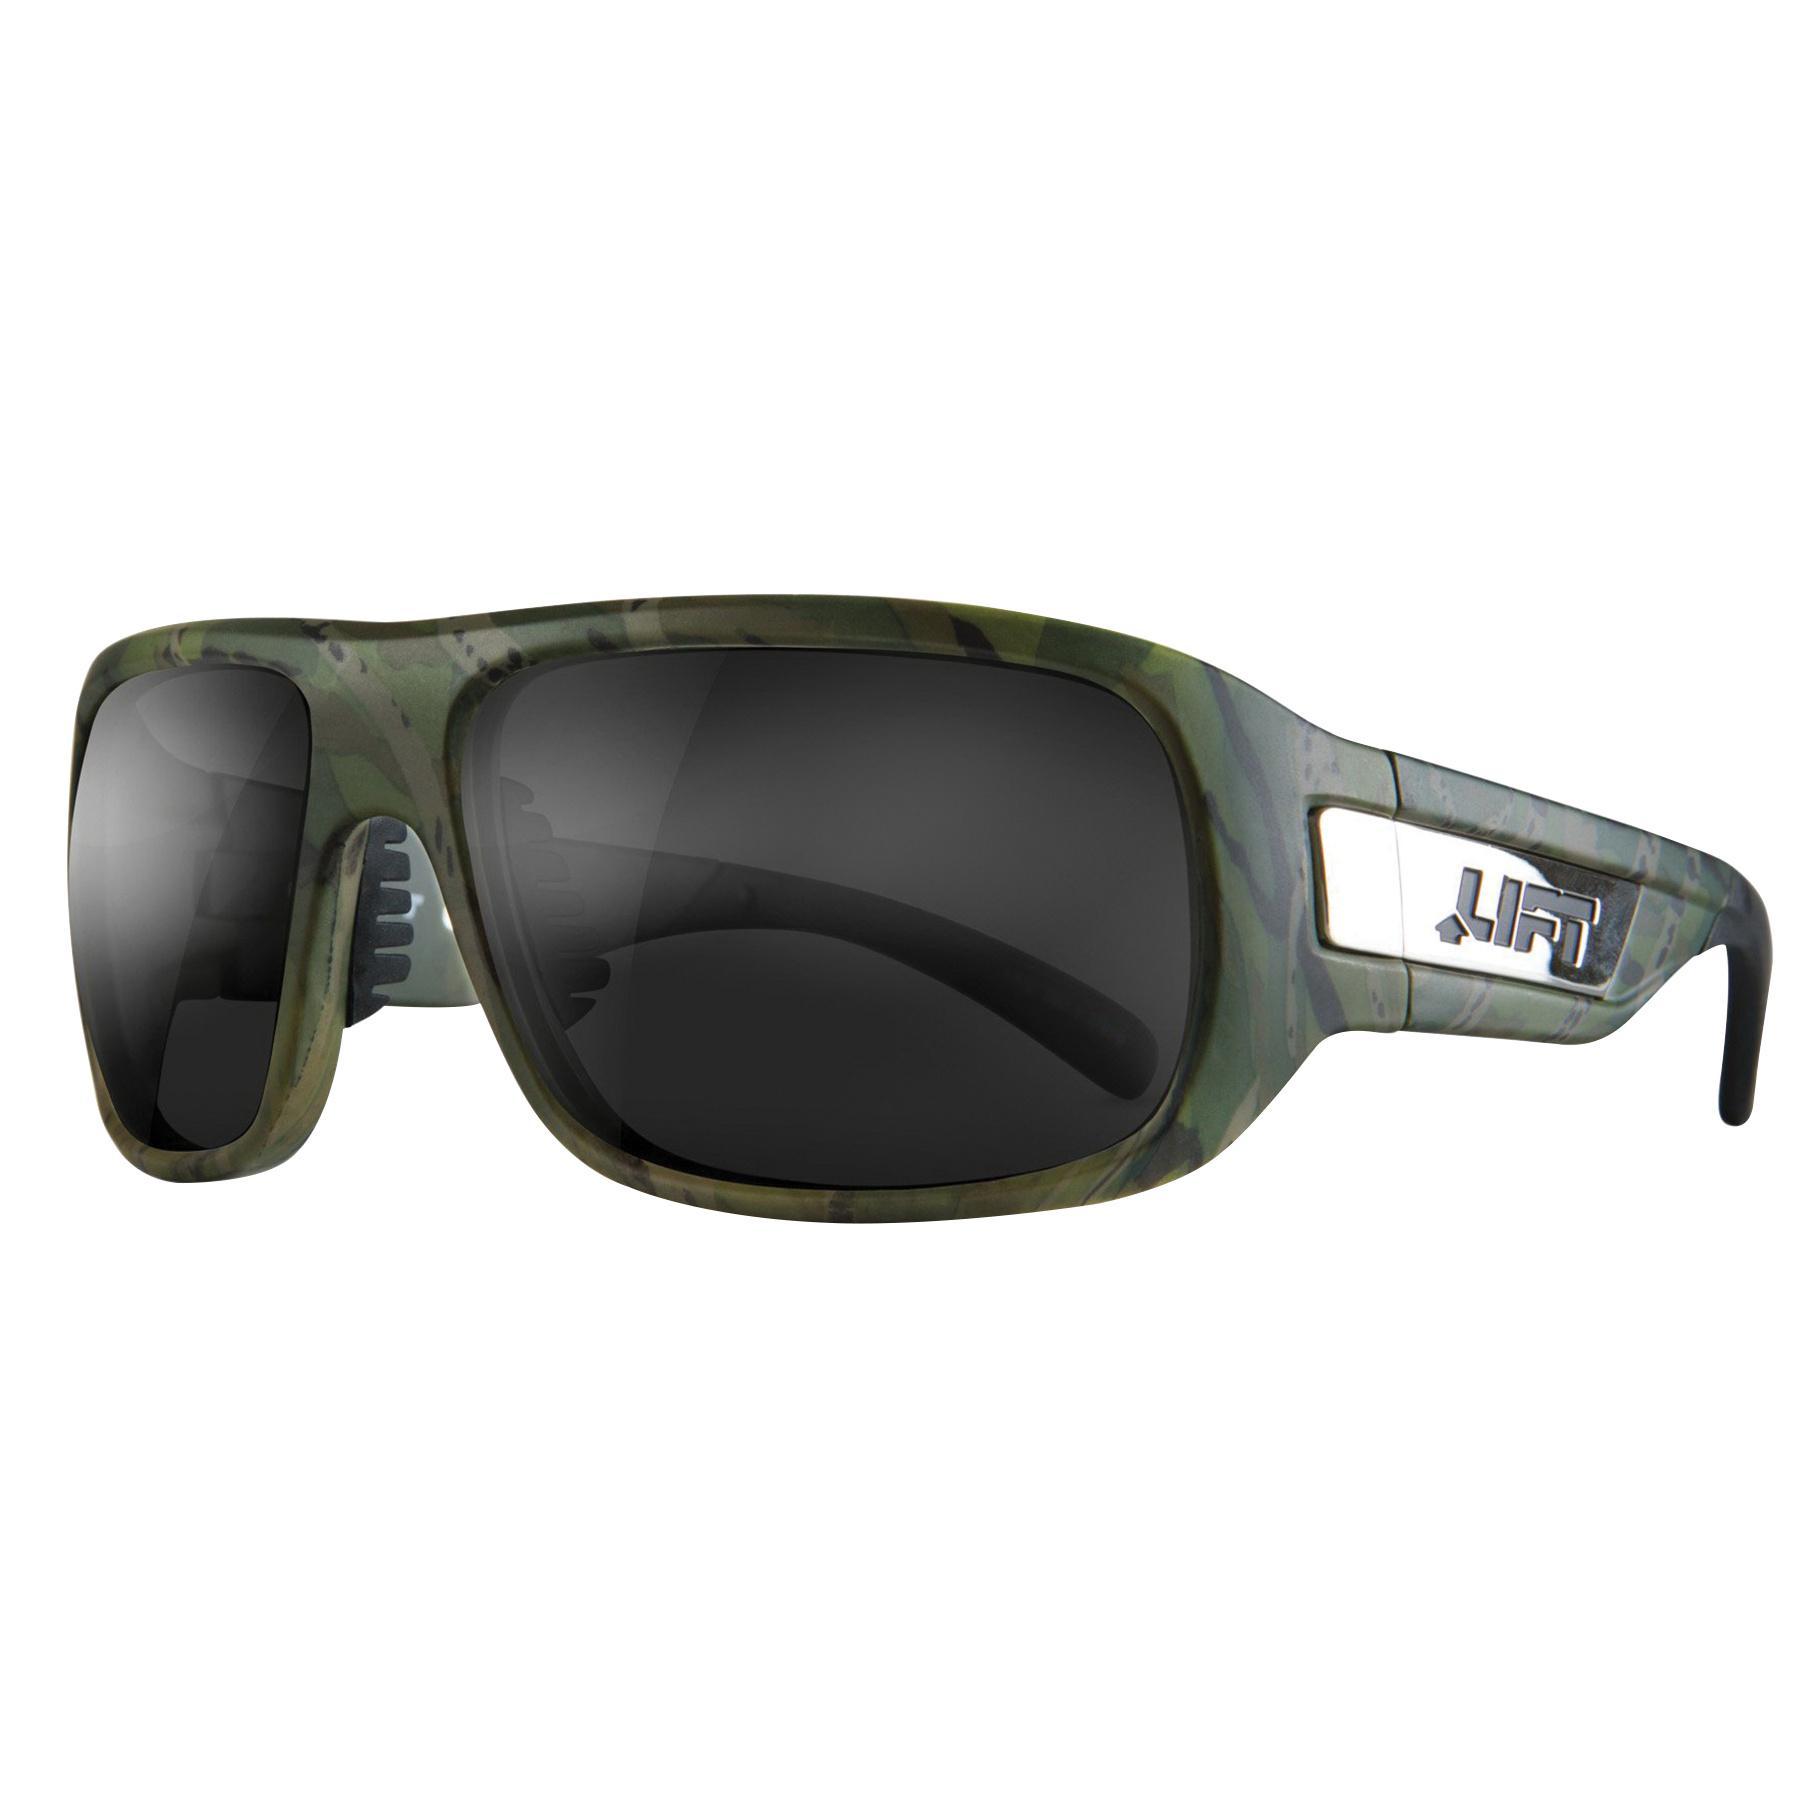 Black Frame//Clear Lens LIFT Safety Alias Safety Glasses